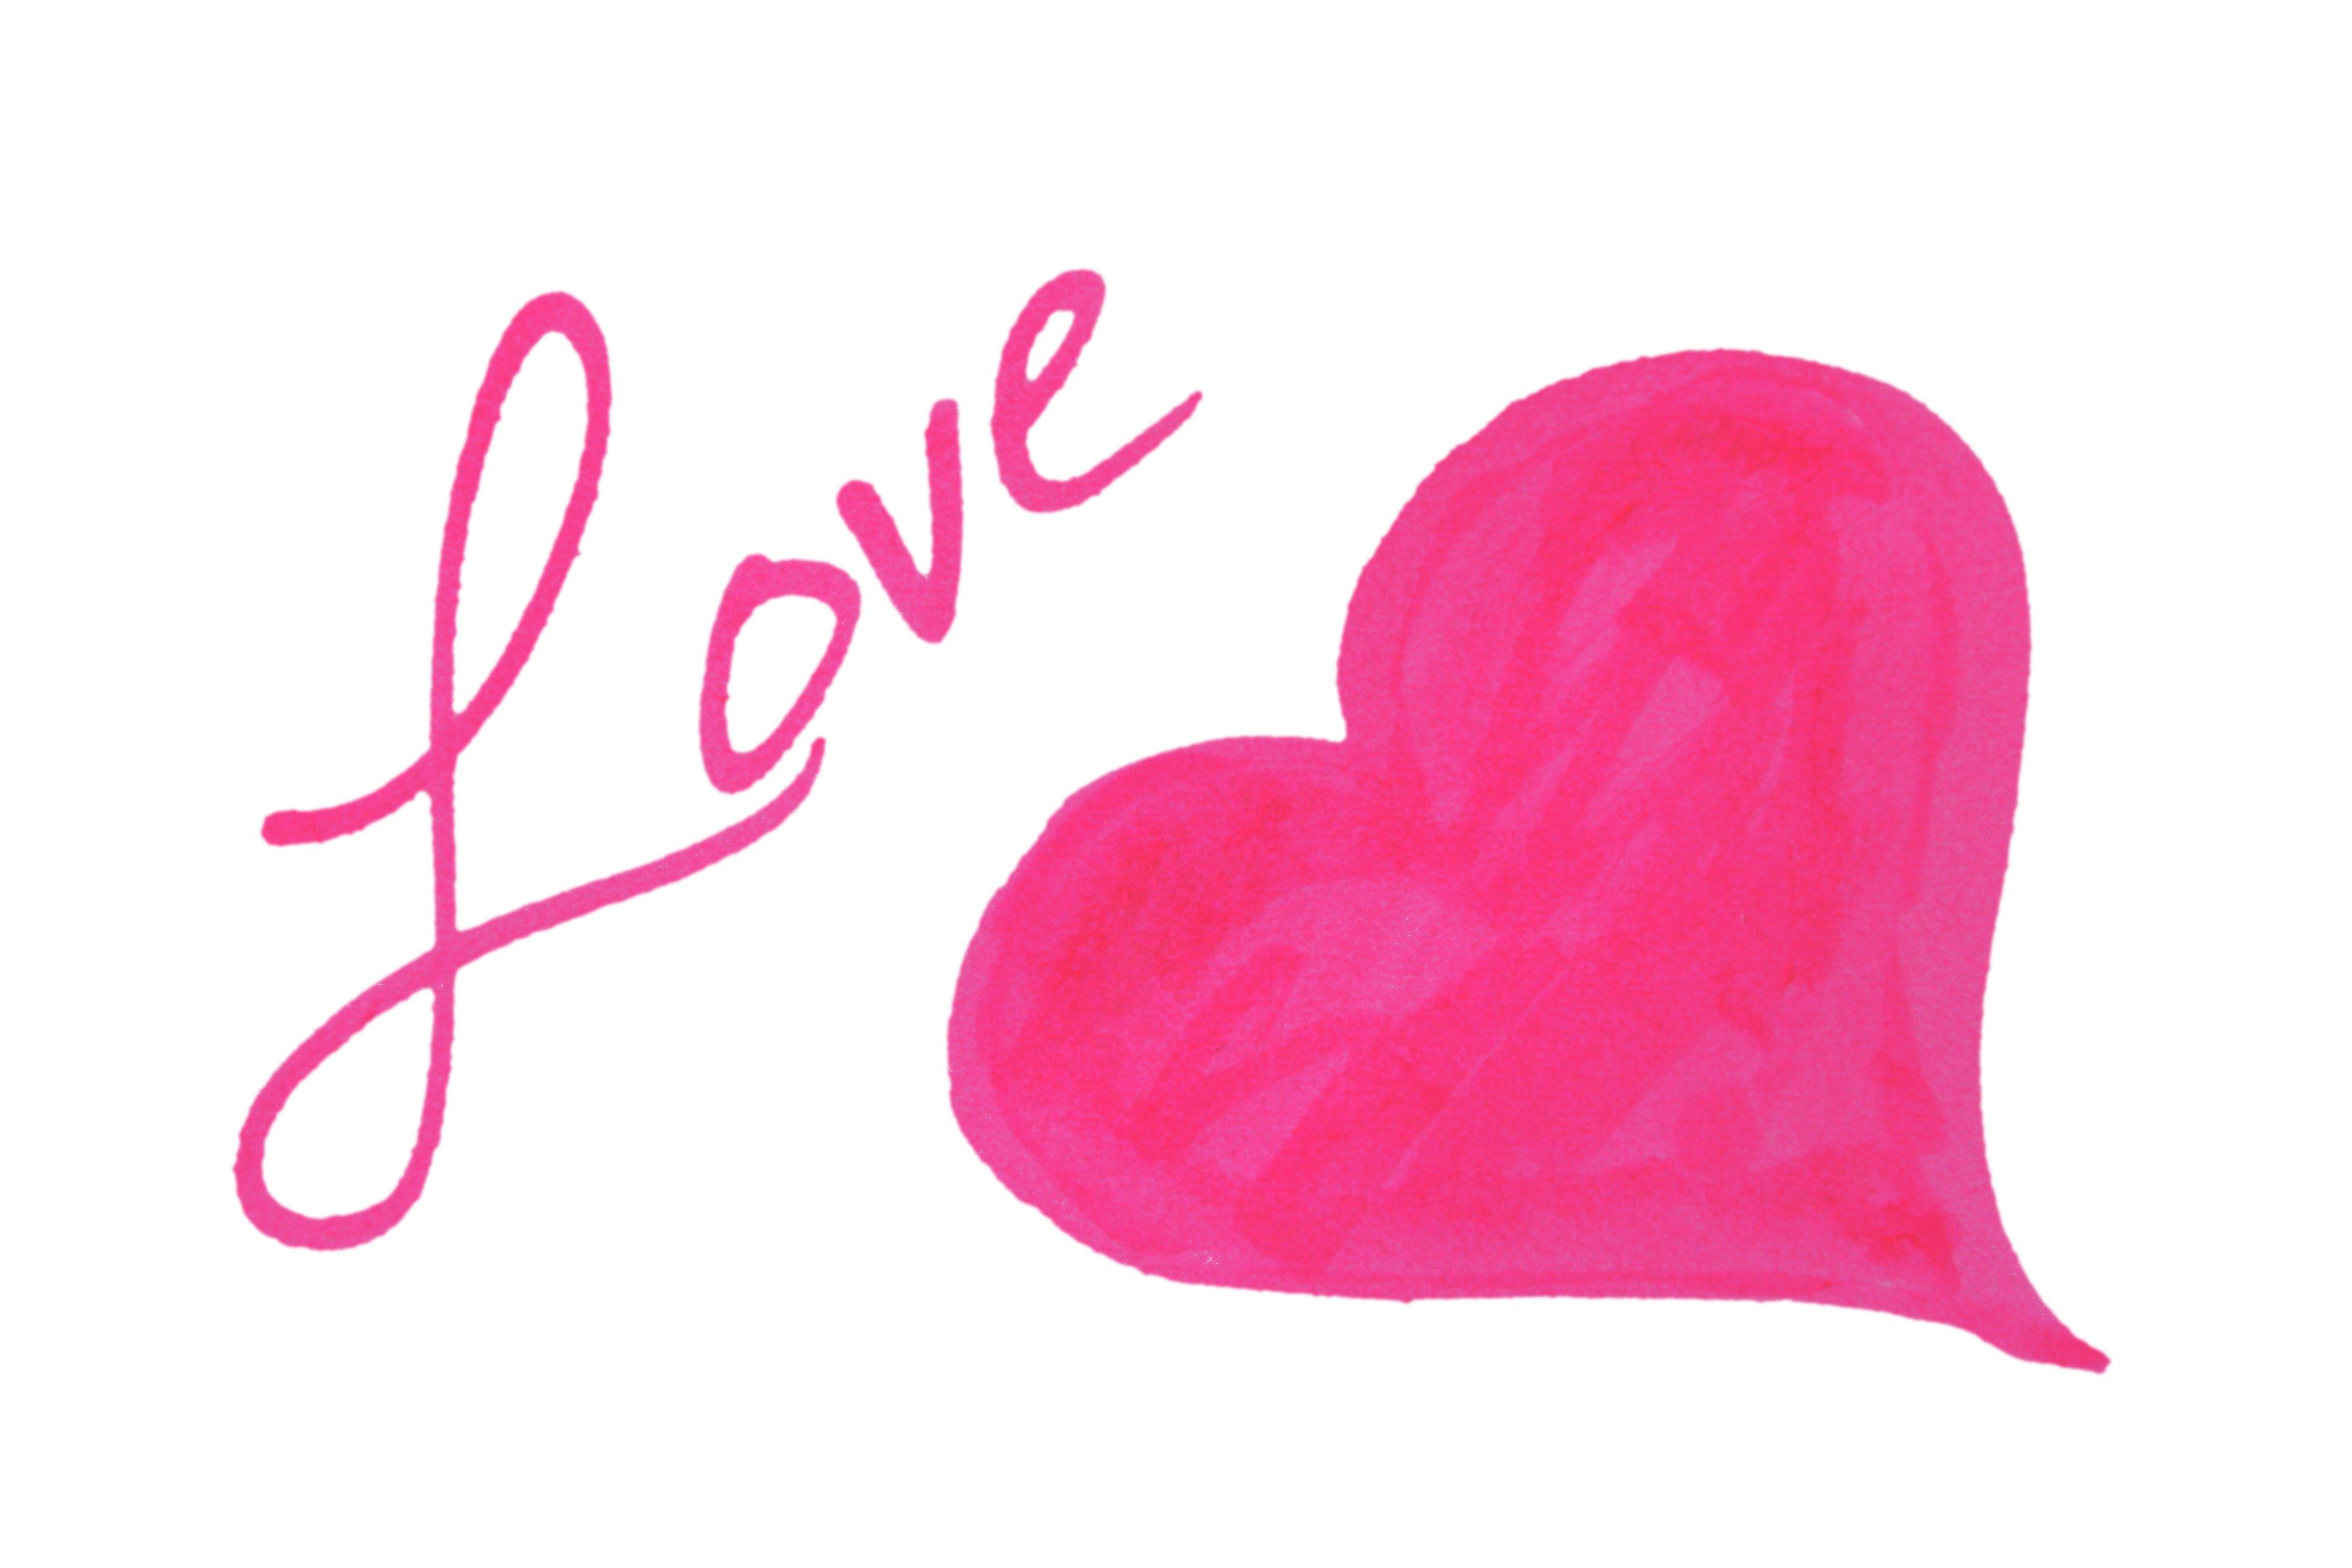 3888x2592 Hearts Clipart Love Heart Clip